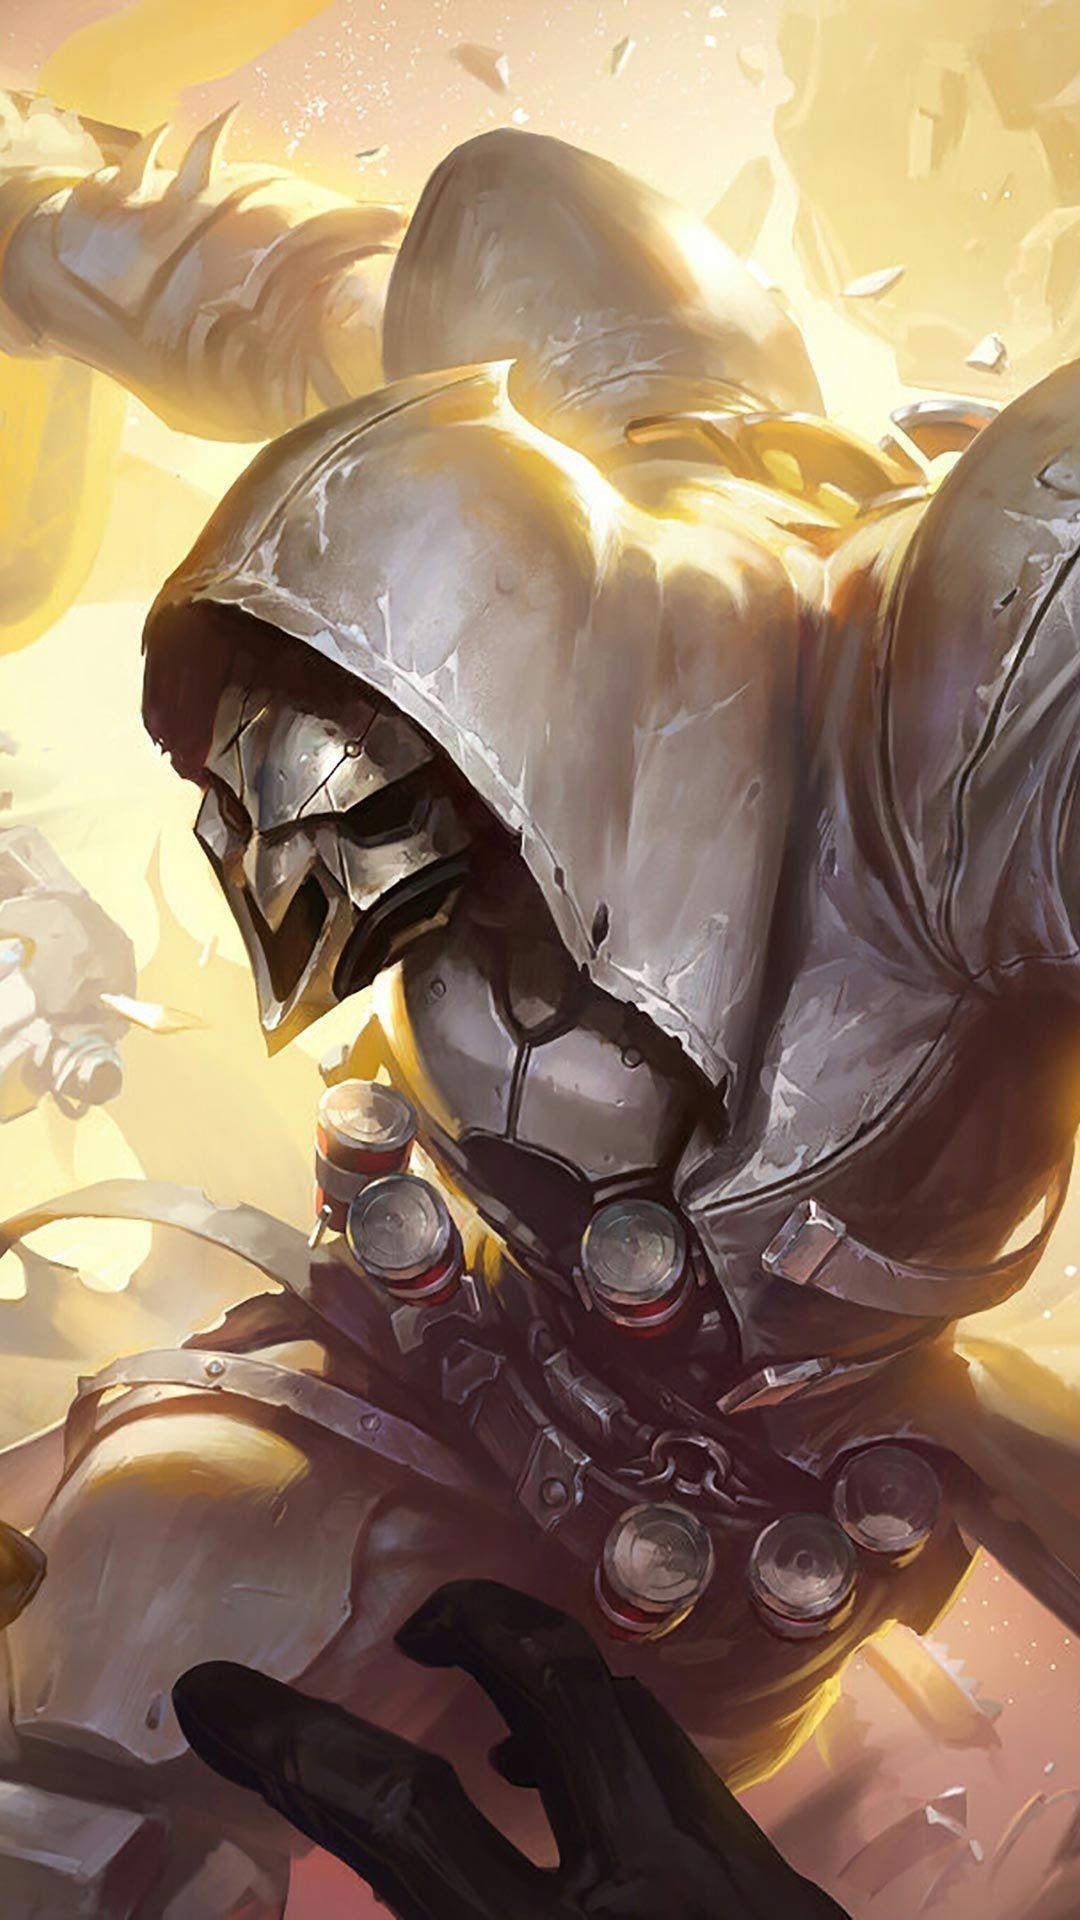 Reaper Overwatch Wallpapers 69 Pictures